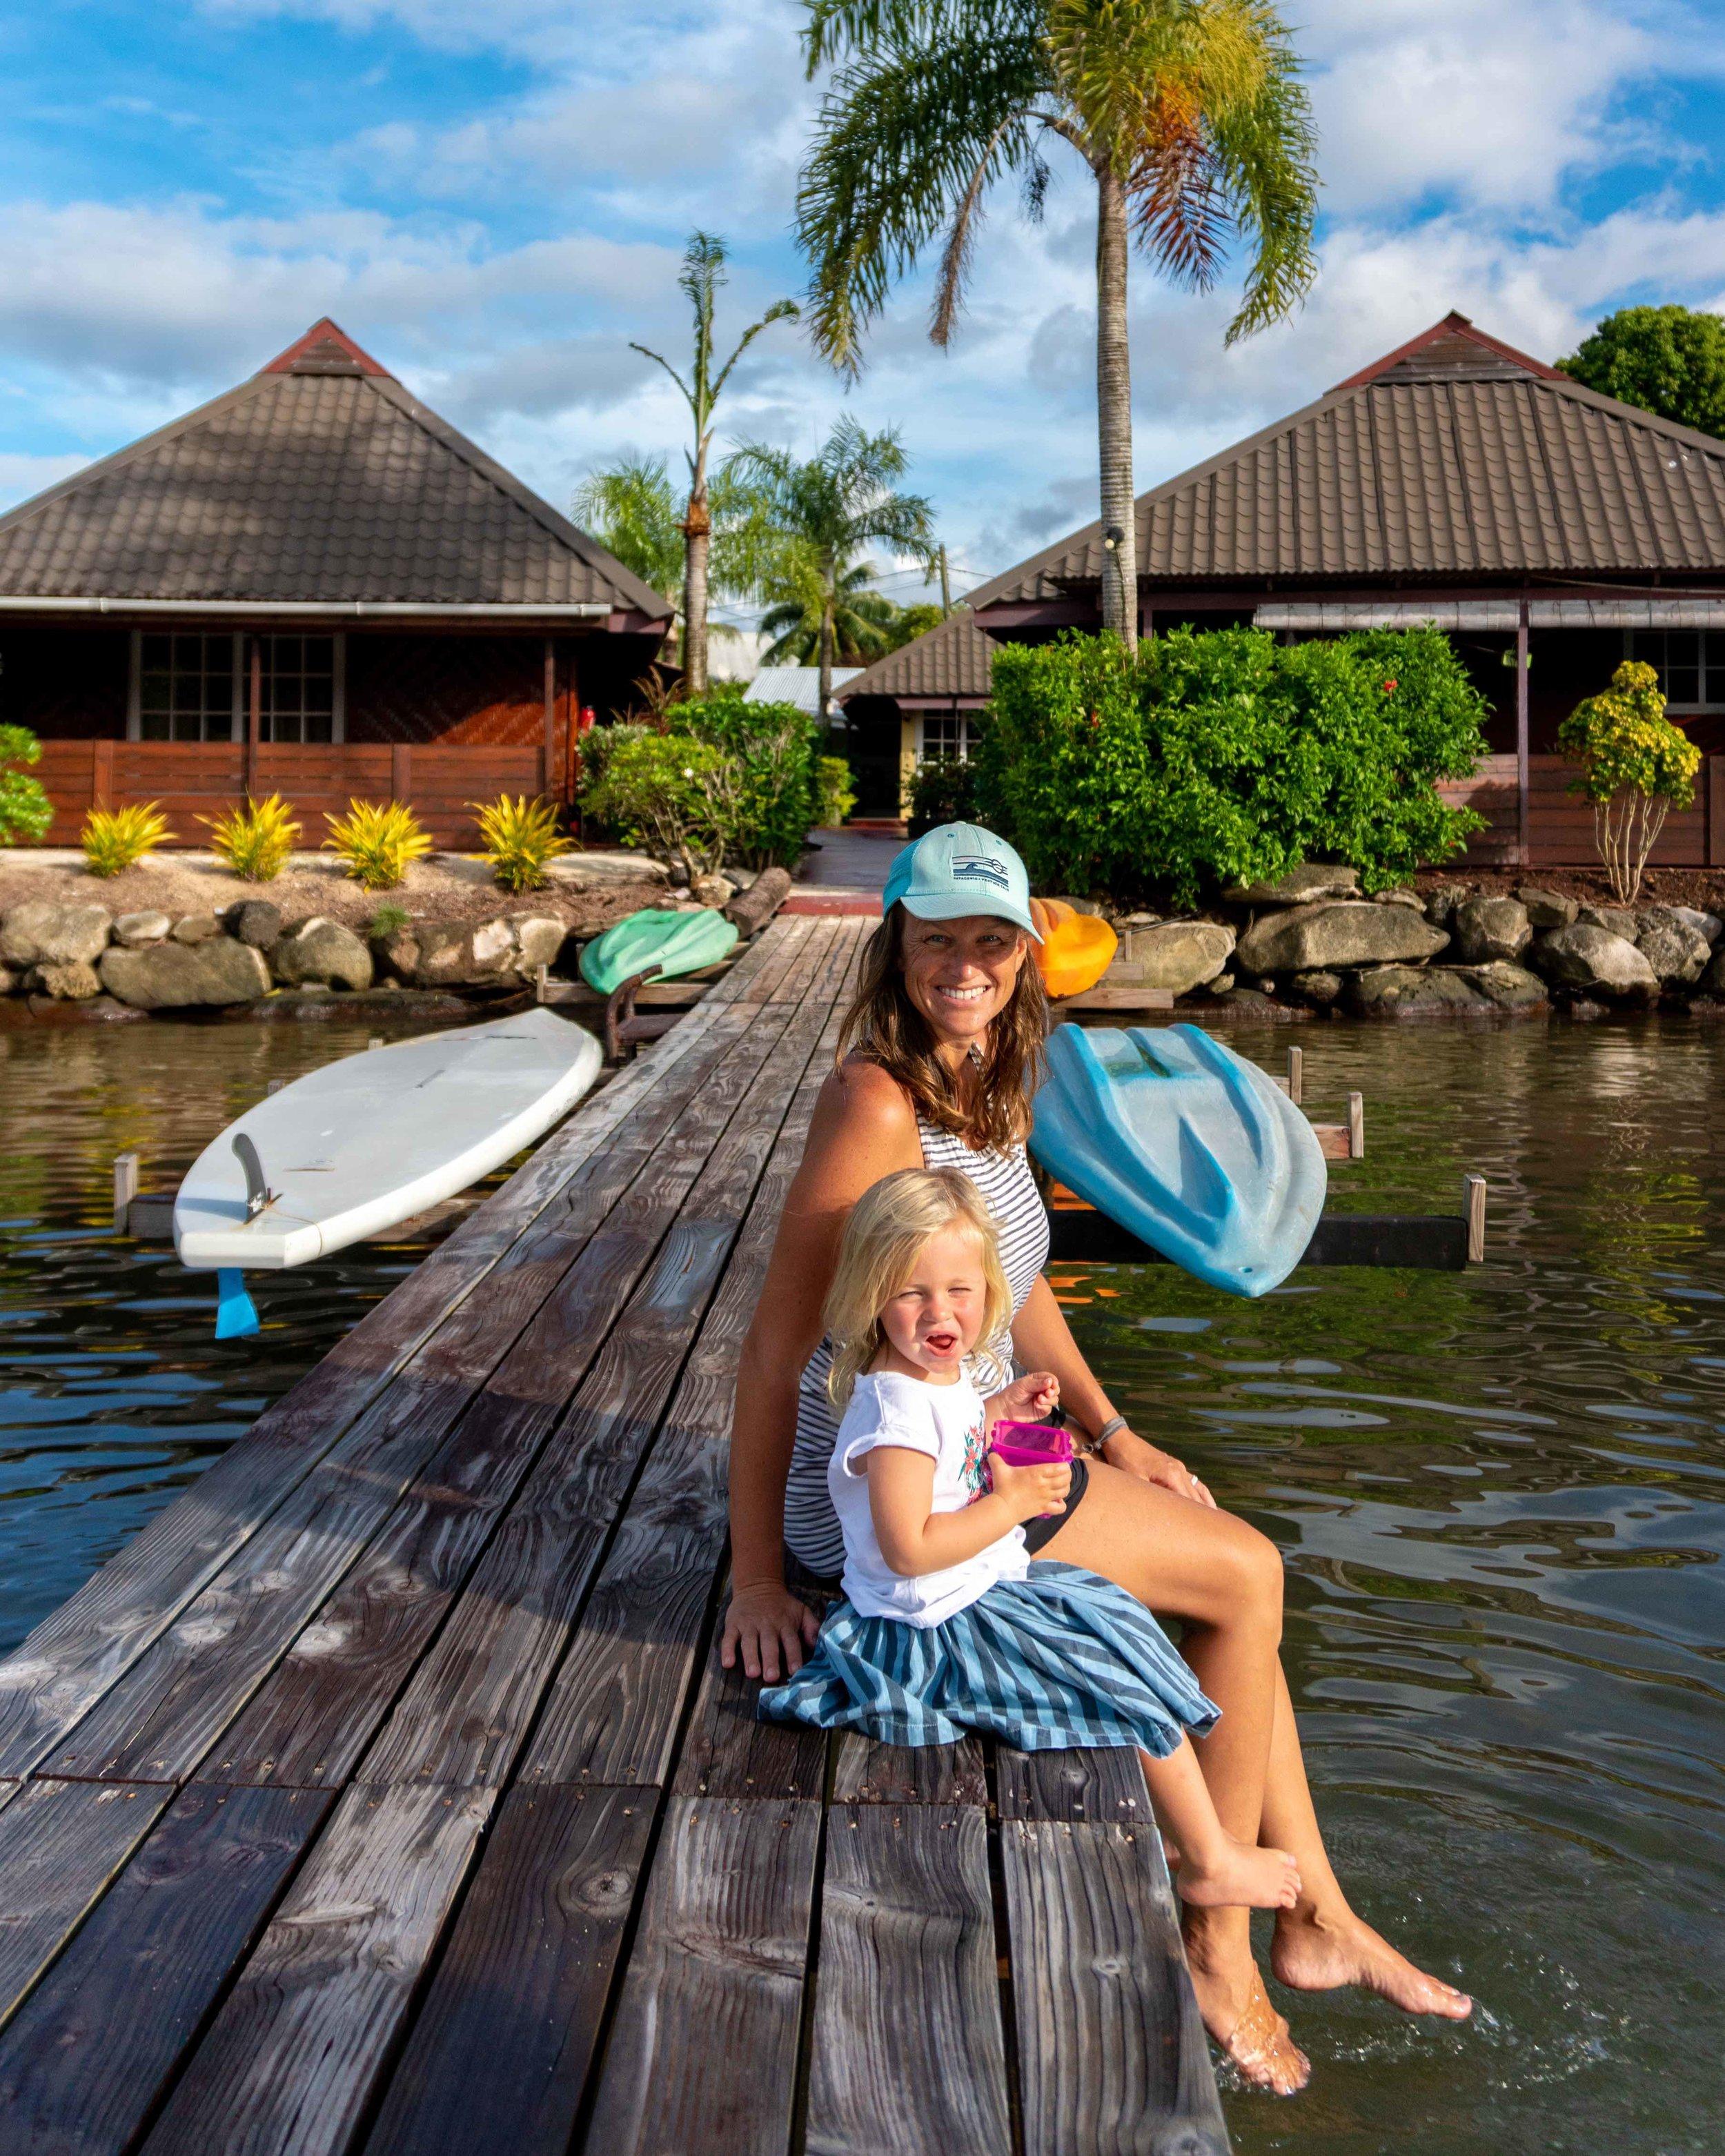 tropical_paradise_beach_island_raiatea_bungalow_french polynesia_south pacific_beach_mom_daughter_dock 3.jpg